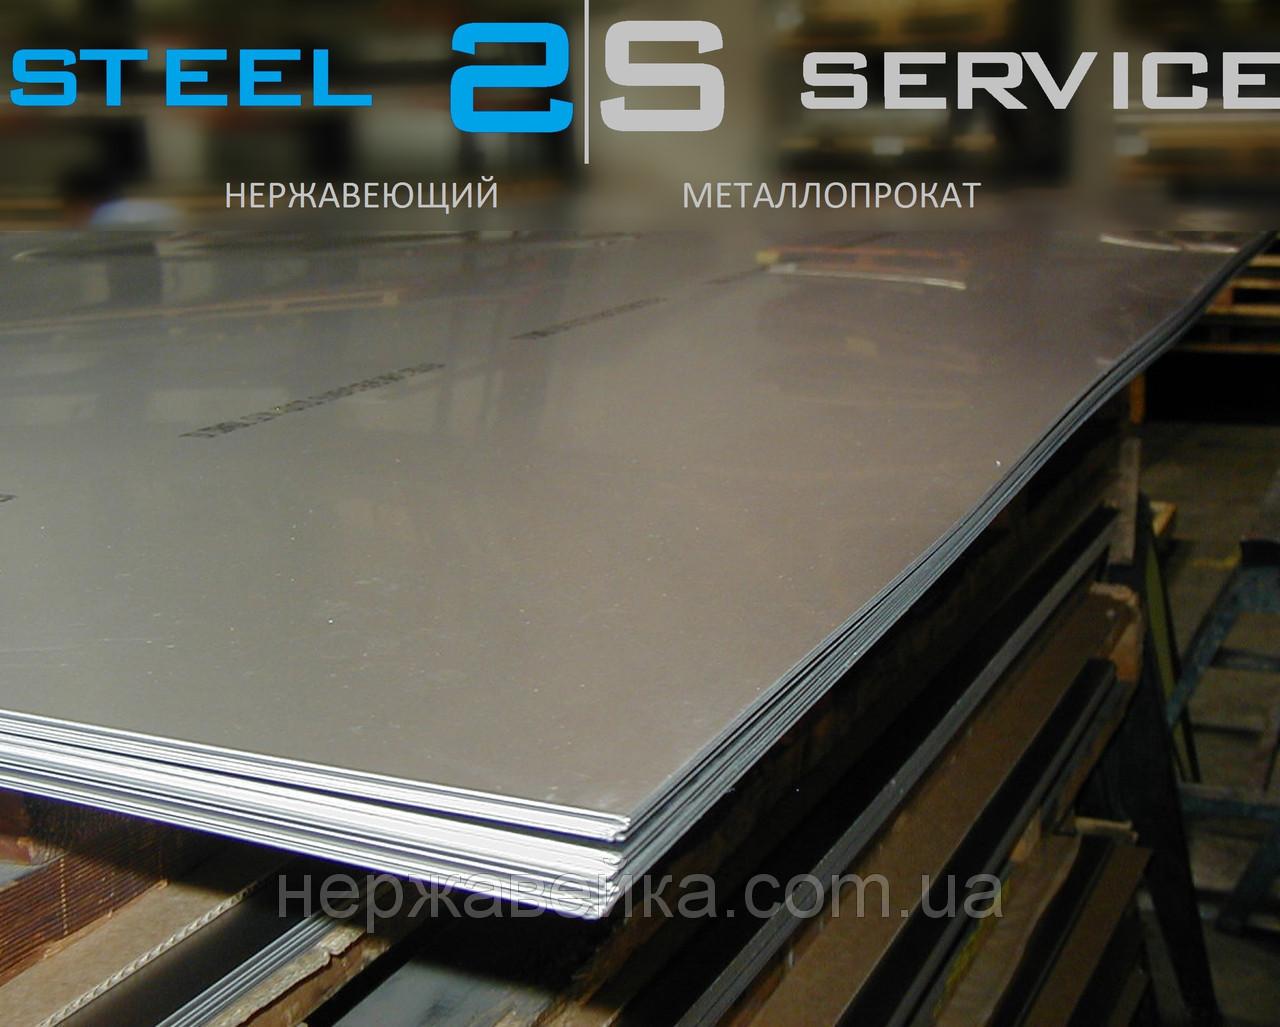 Нержавейка лист 12х1500х6000мм AISI 410S(08Х13) F1 - горячекатанный, технический